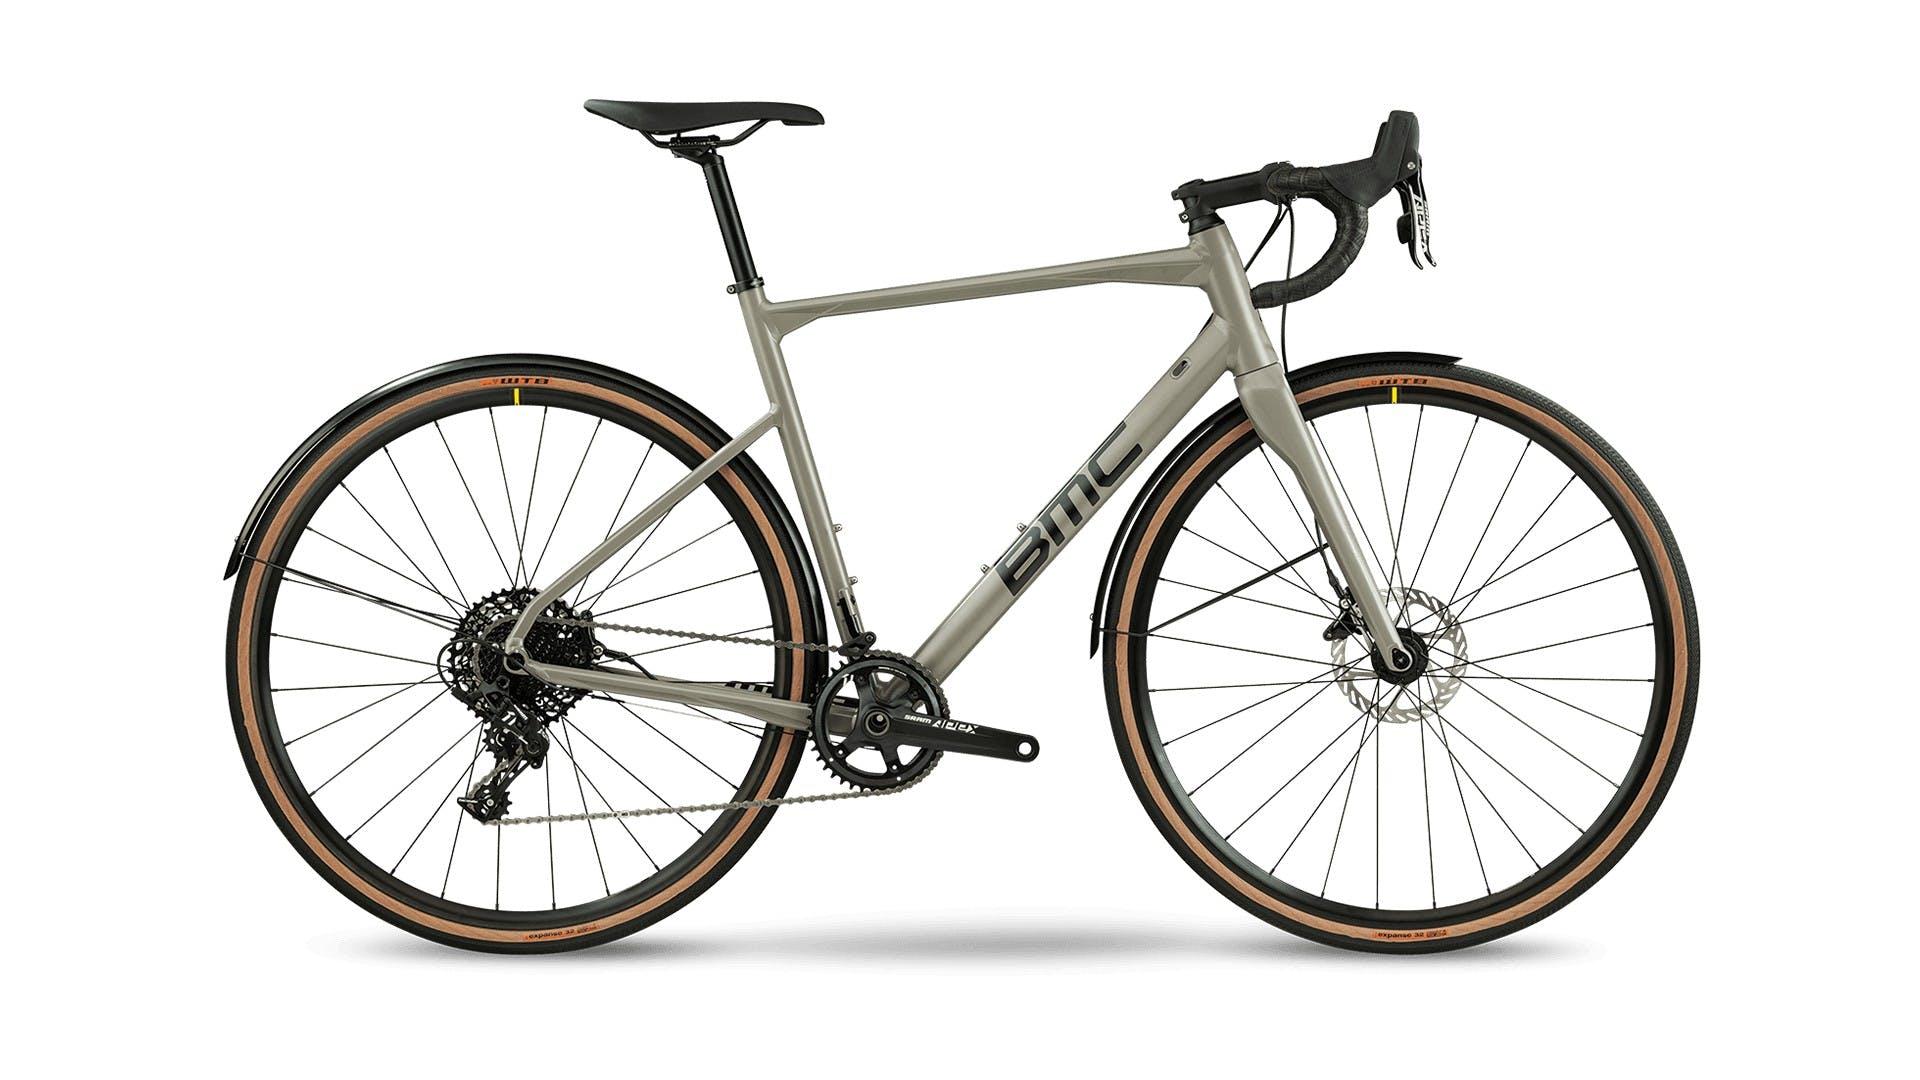 BMC RoadMachine X bici gravel